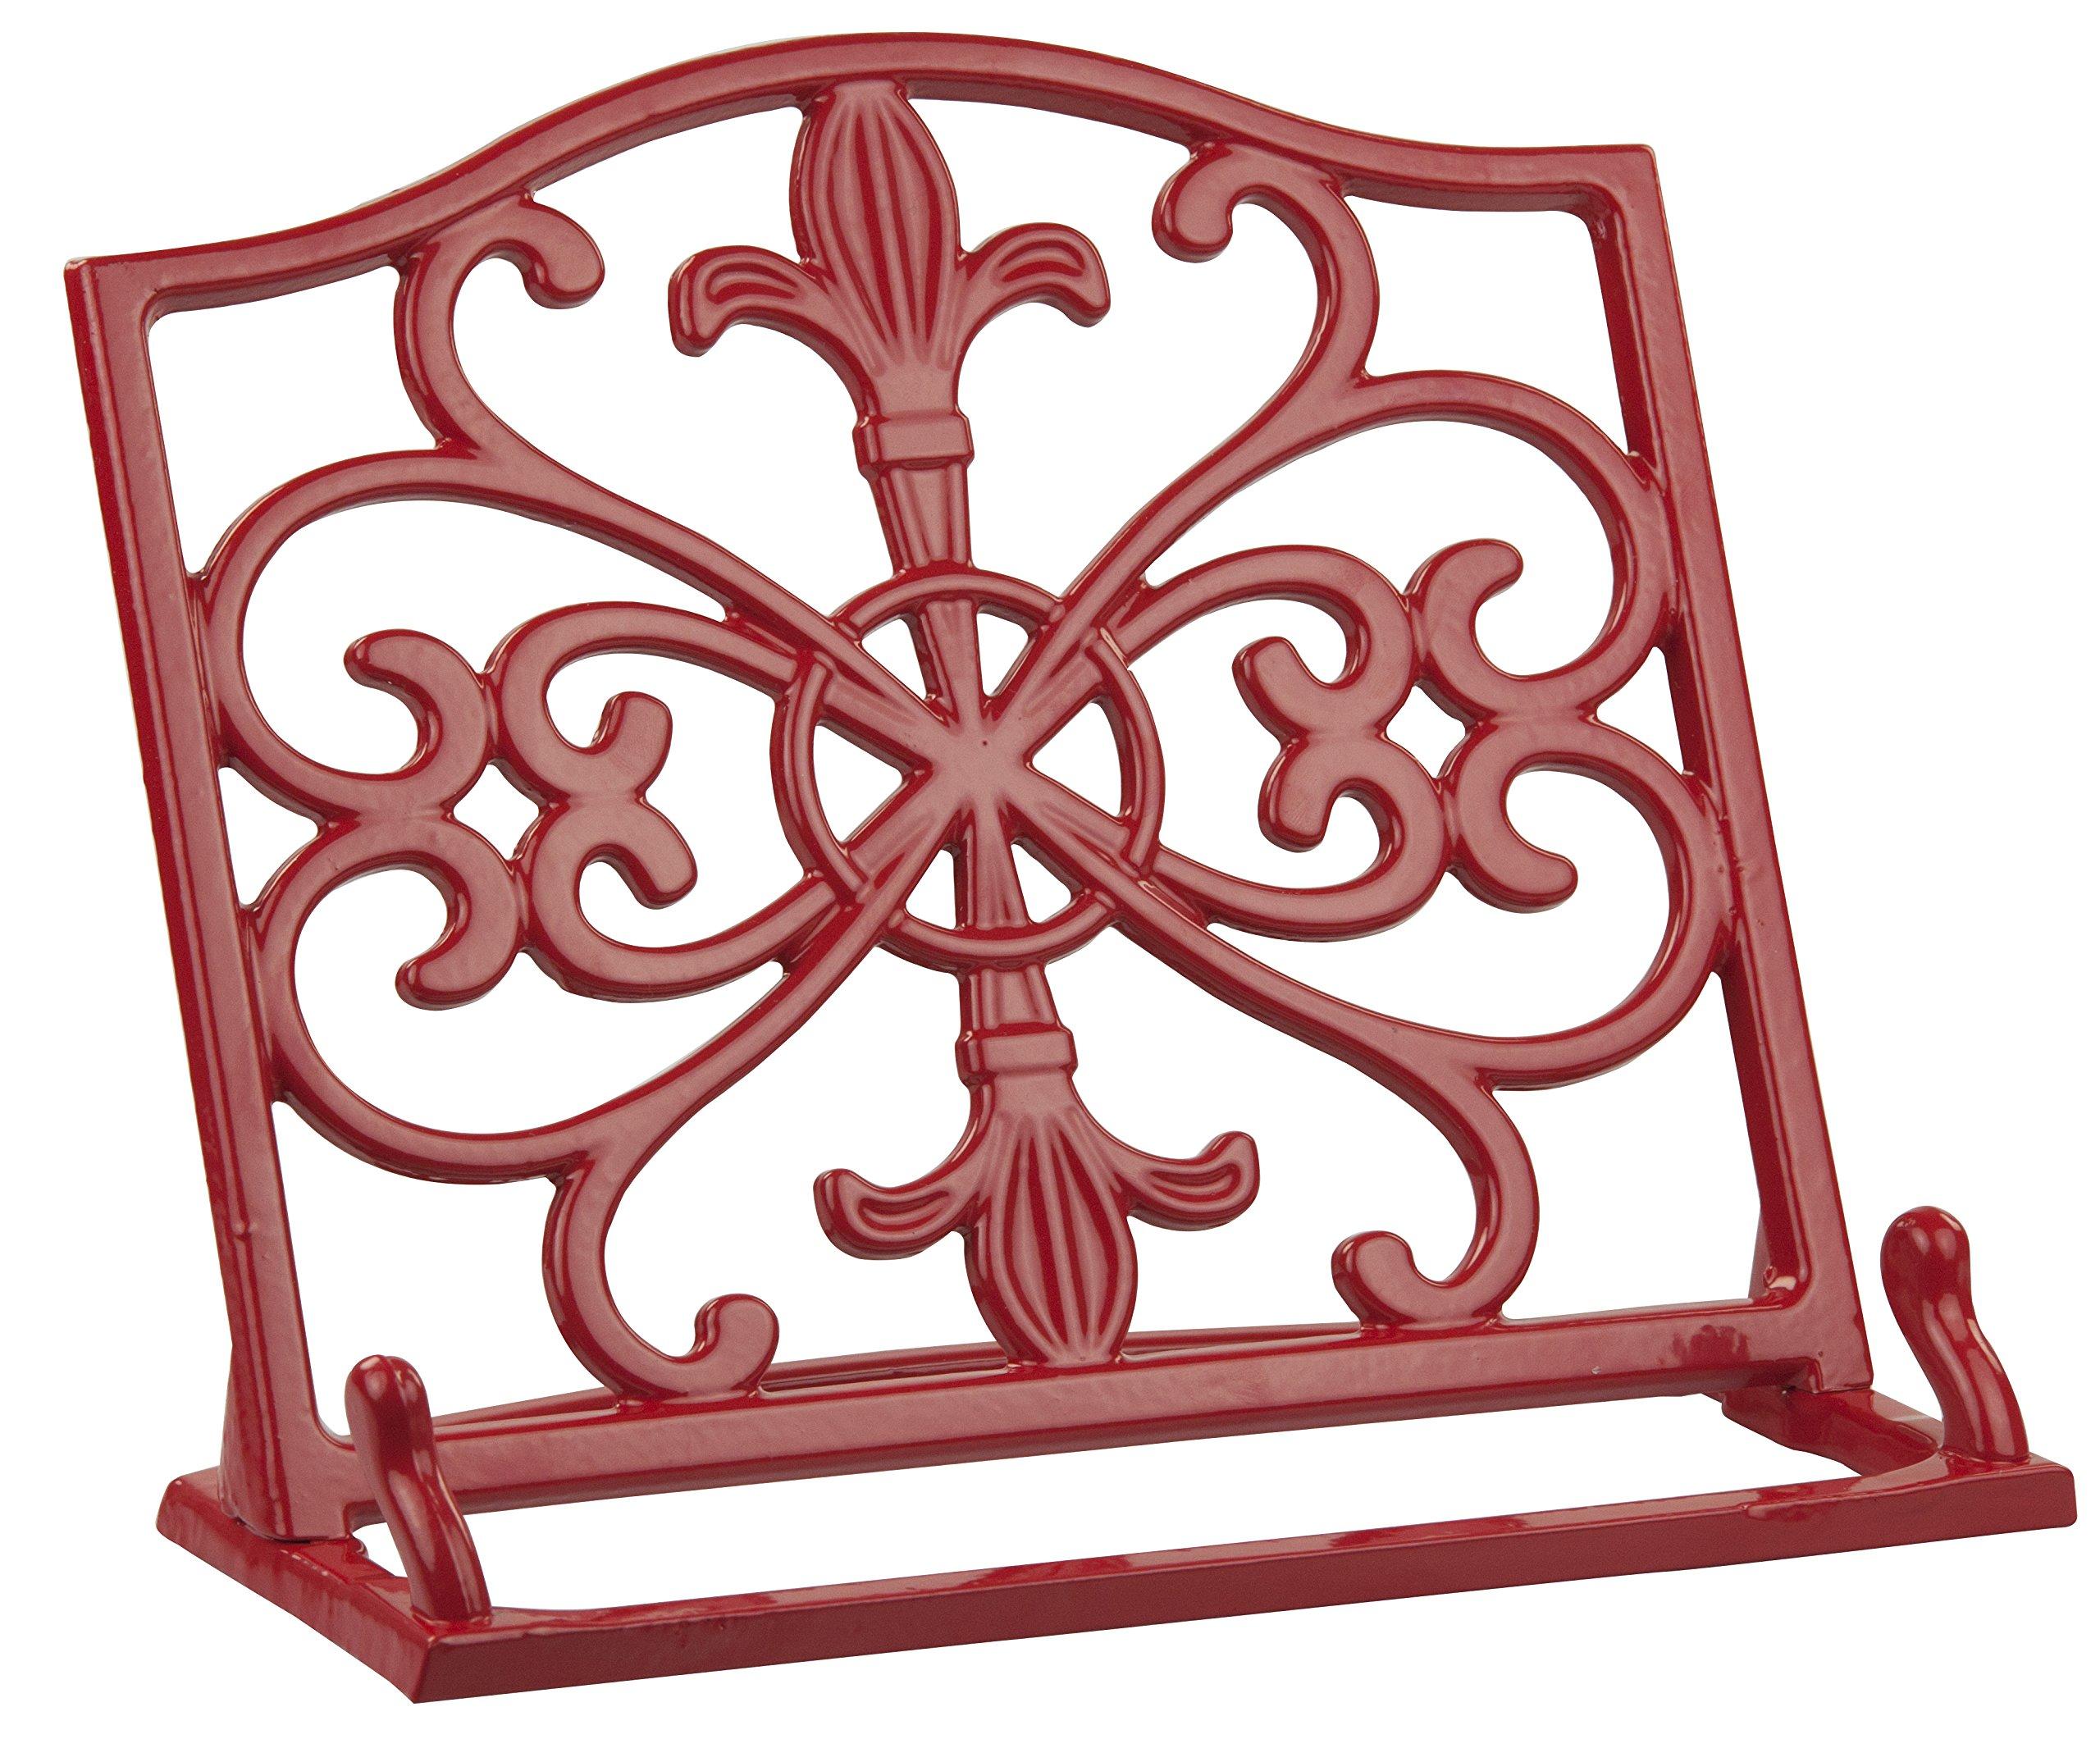 Home Basics Cast Iron Fleur De Lis Cookbook Stand, Red